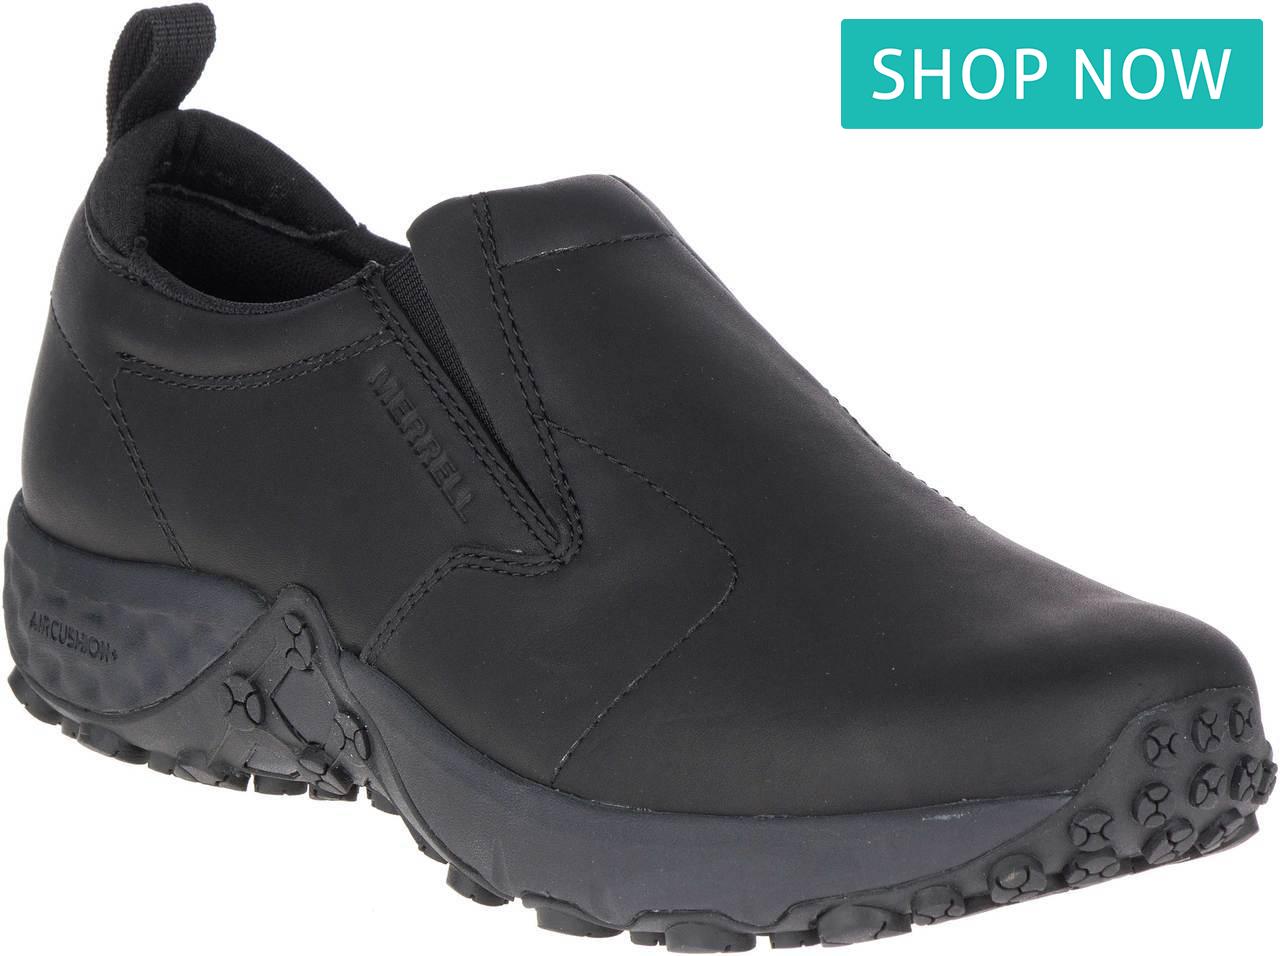 Merrell Men's Jungle Moc AC+ Pro Work Shoe in Black